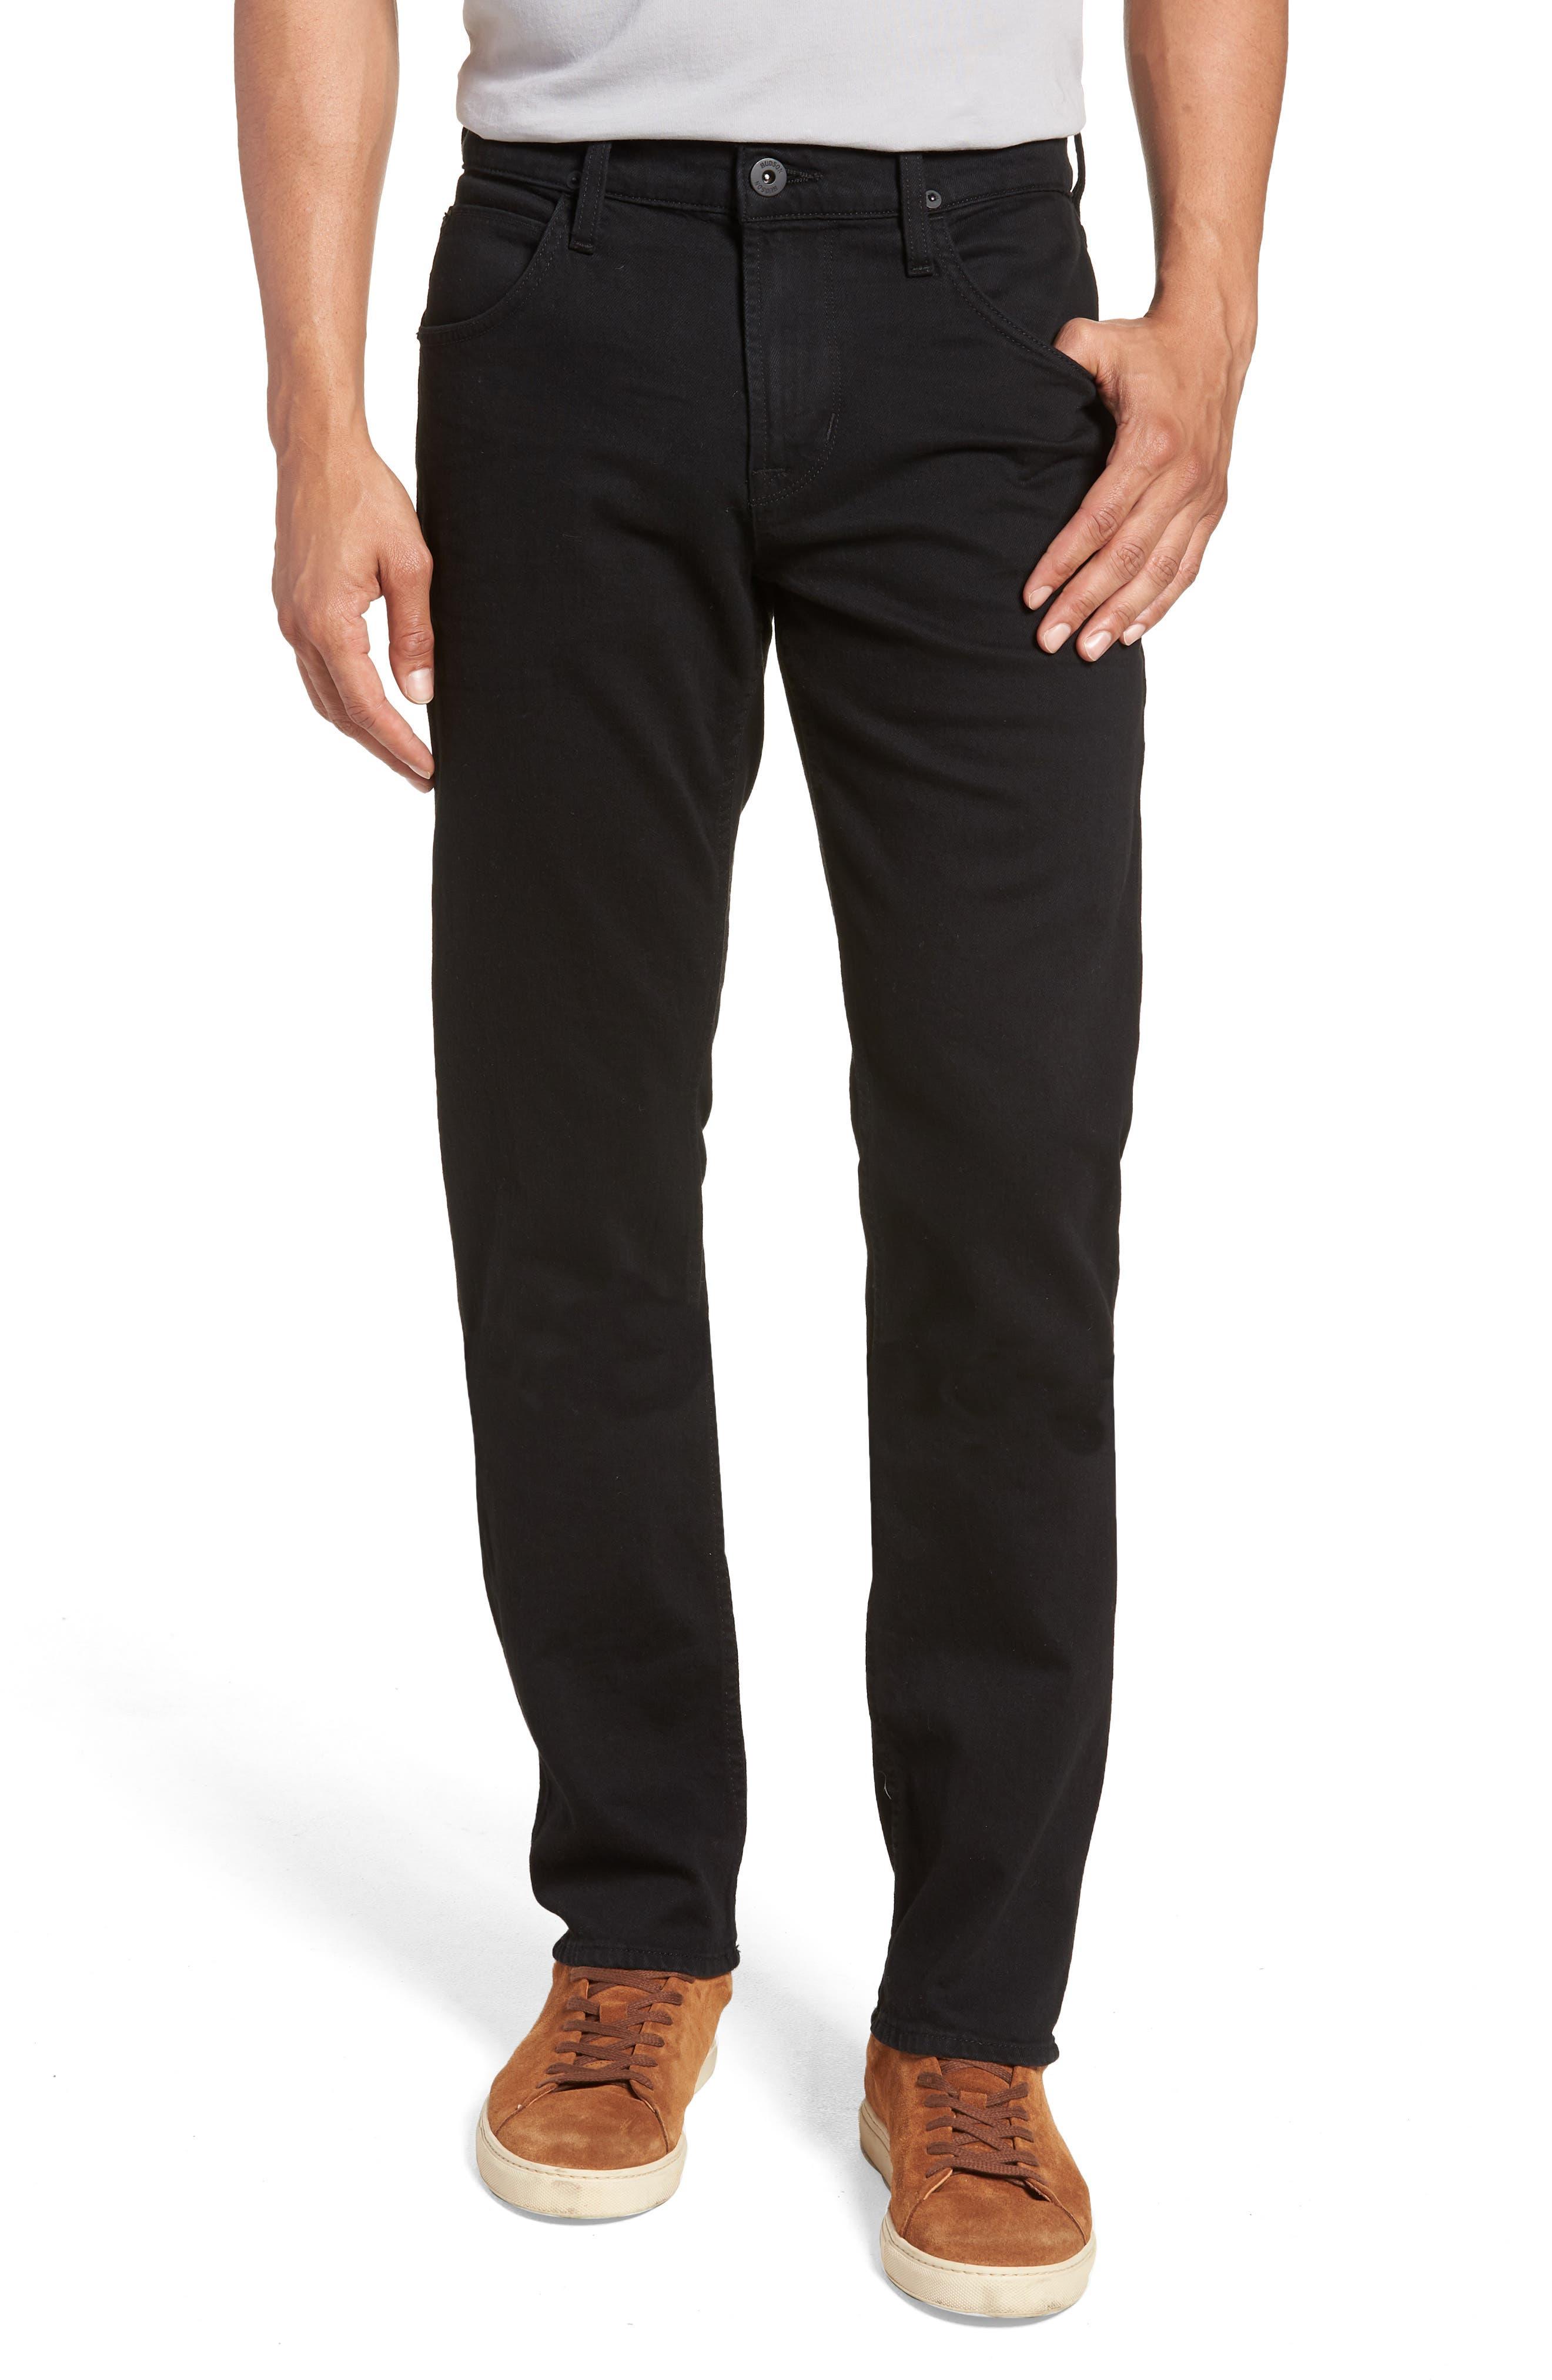 Blake Slim Fit Jeans,                             Main thumbnail 1, color,                             002